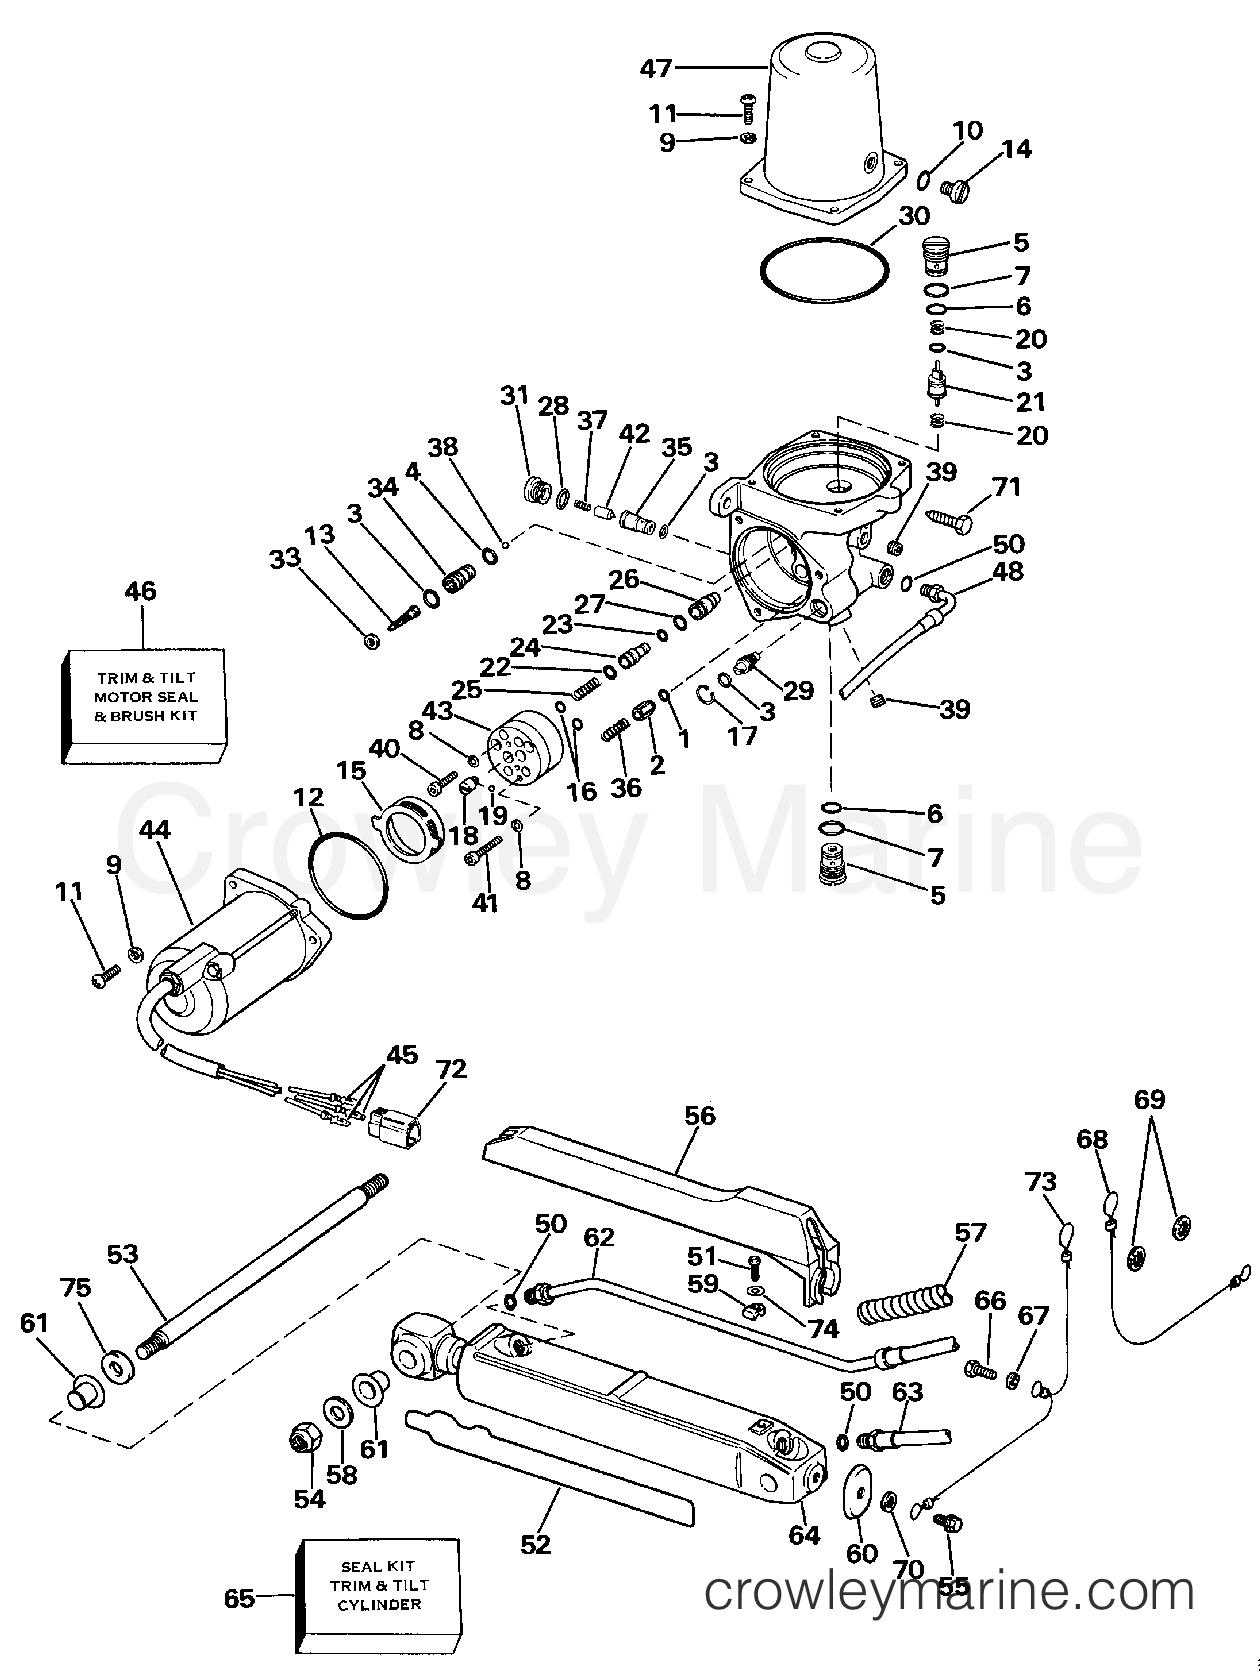 [DIAGRAM] Volvo Penta 3.0 Wiring Diagram FULL Version HD